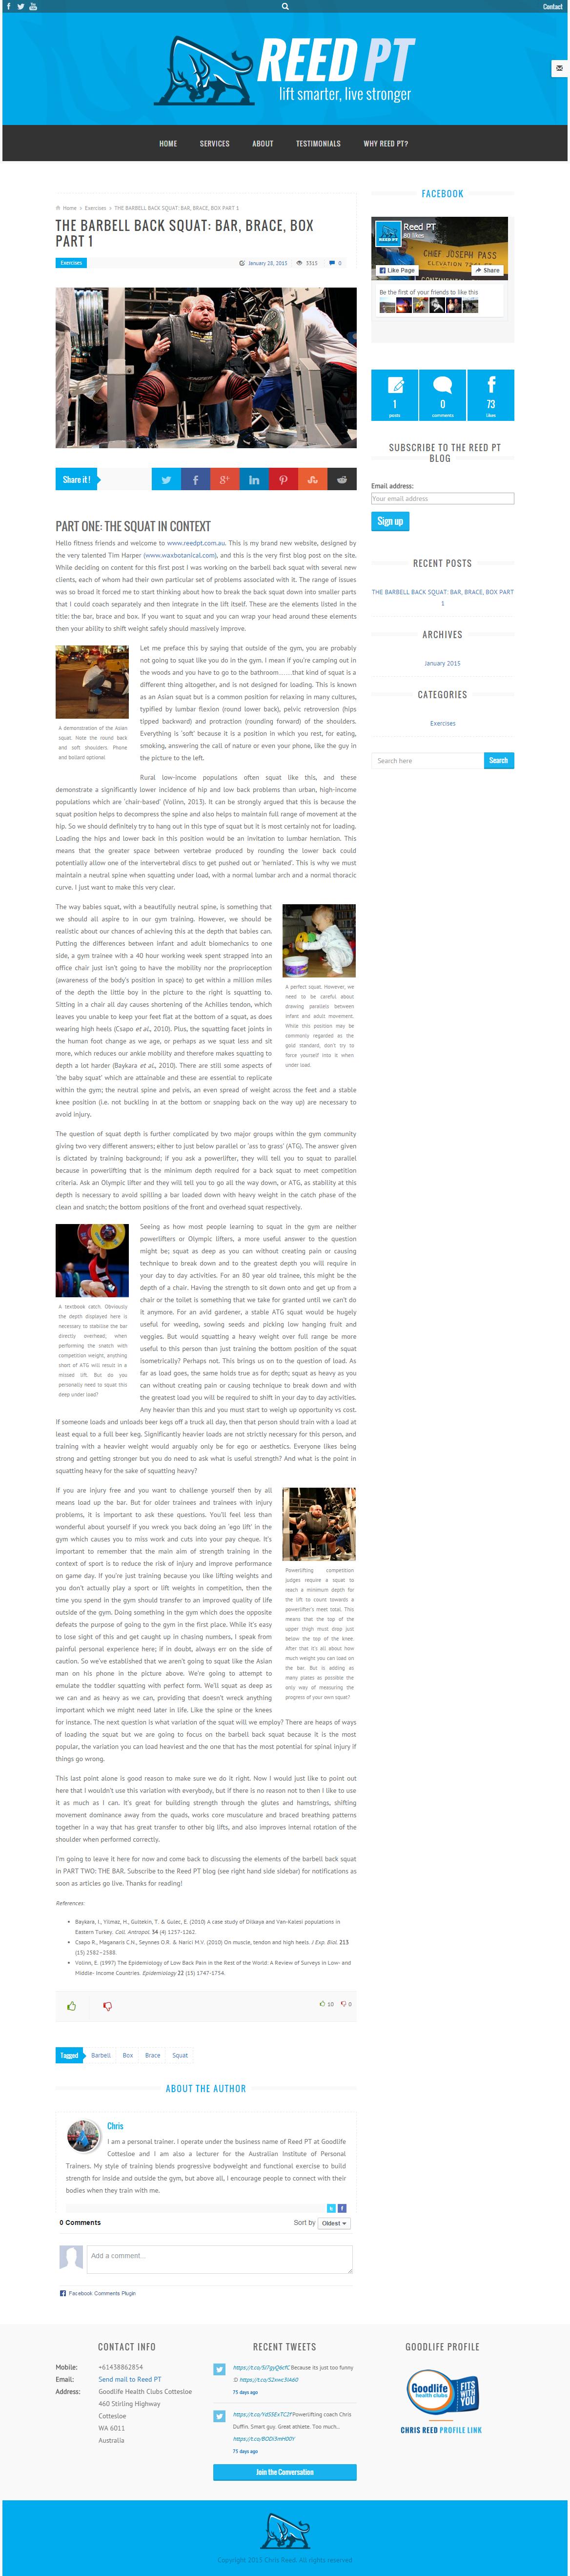 WB-portfolio-web-design-Reed-PT-gallery-1